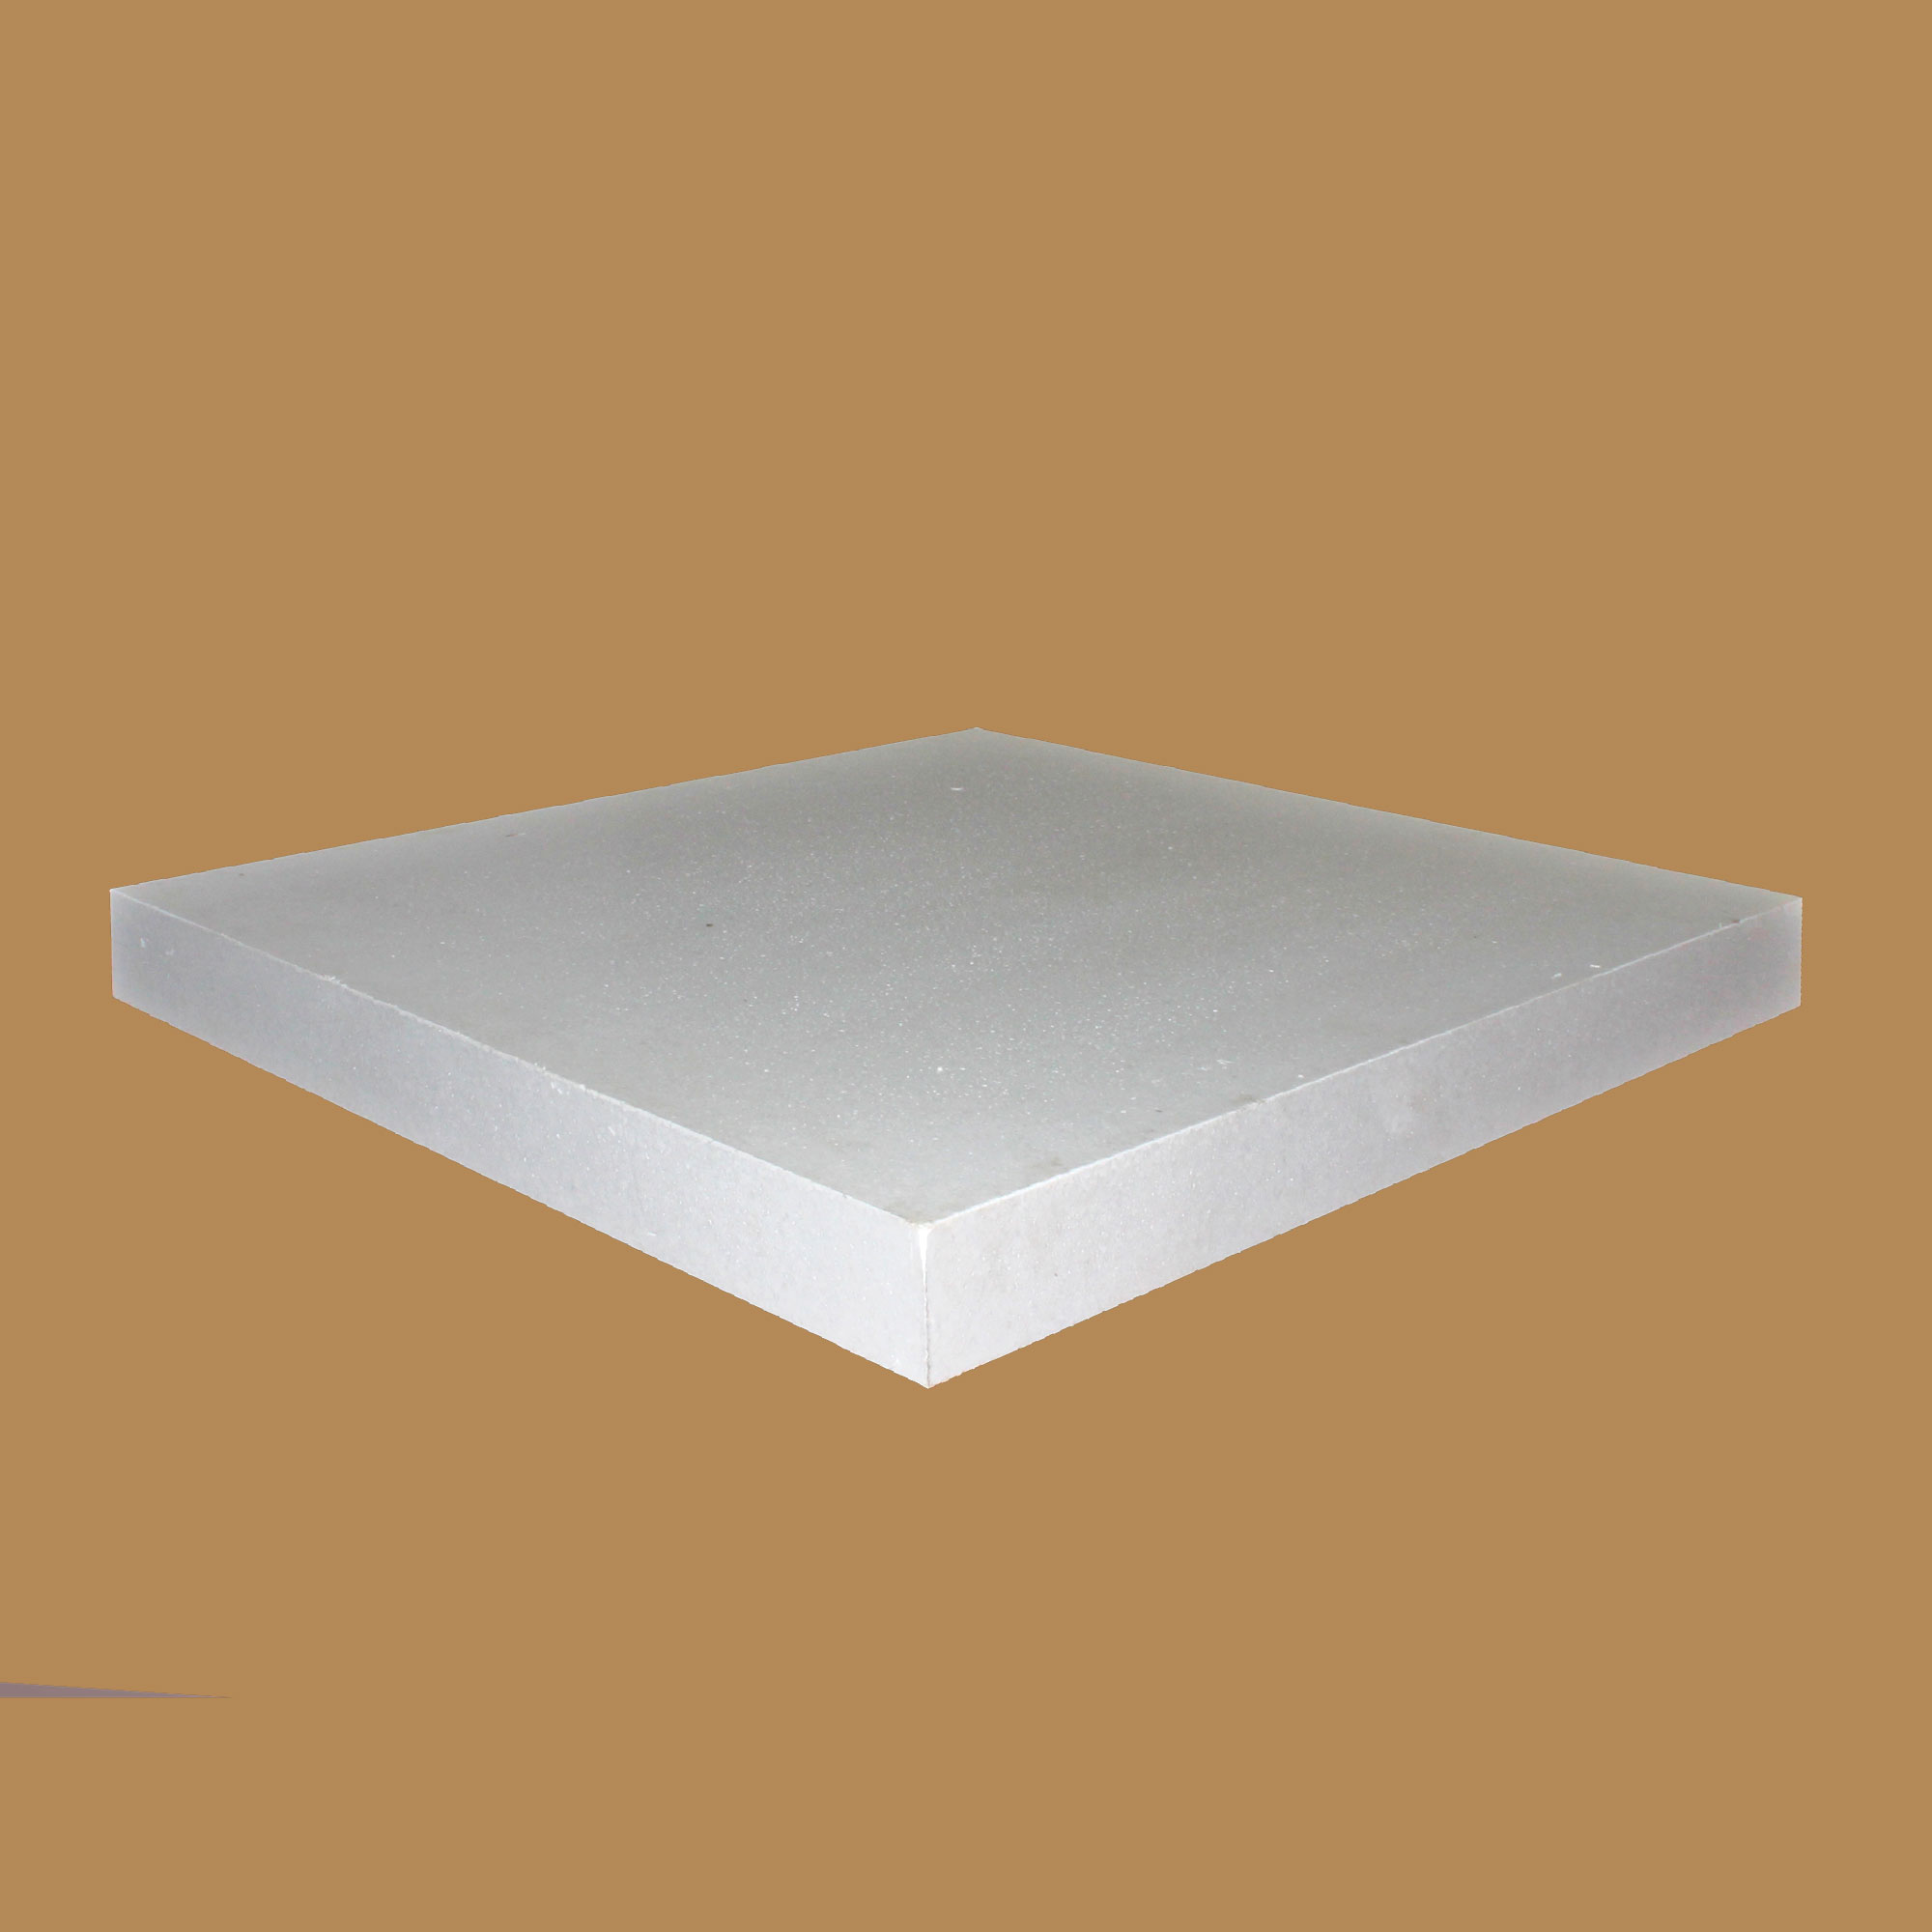 Крыша улья 10-рамочного